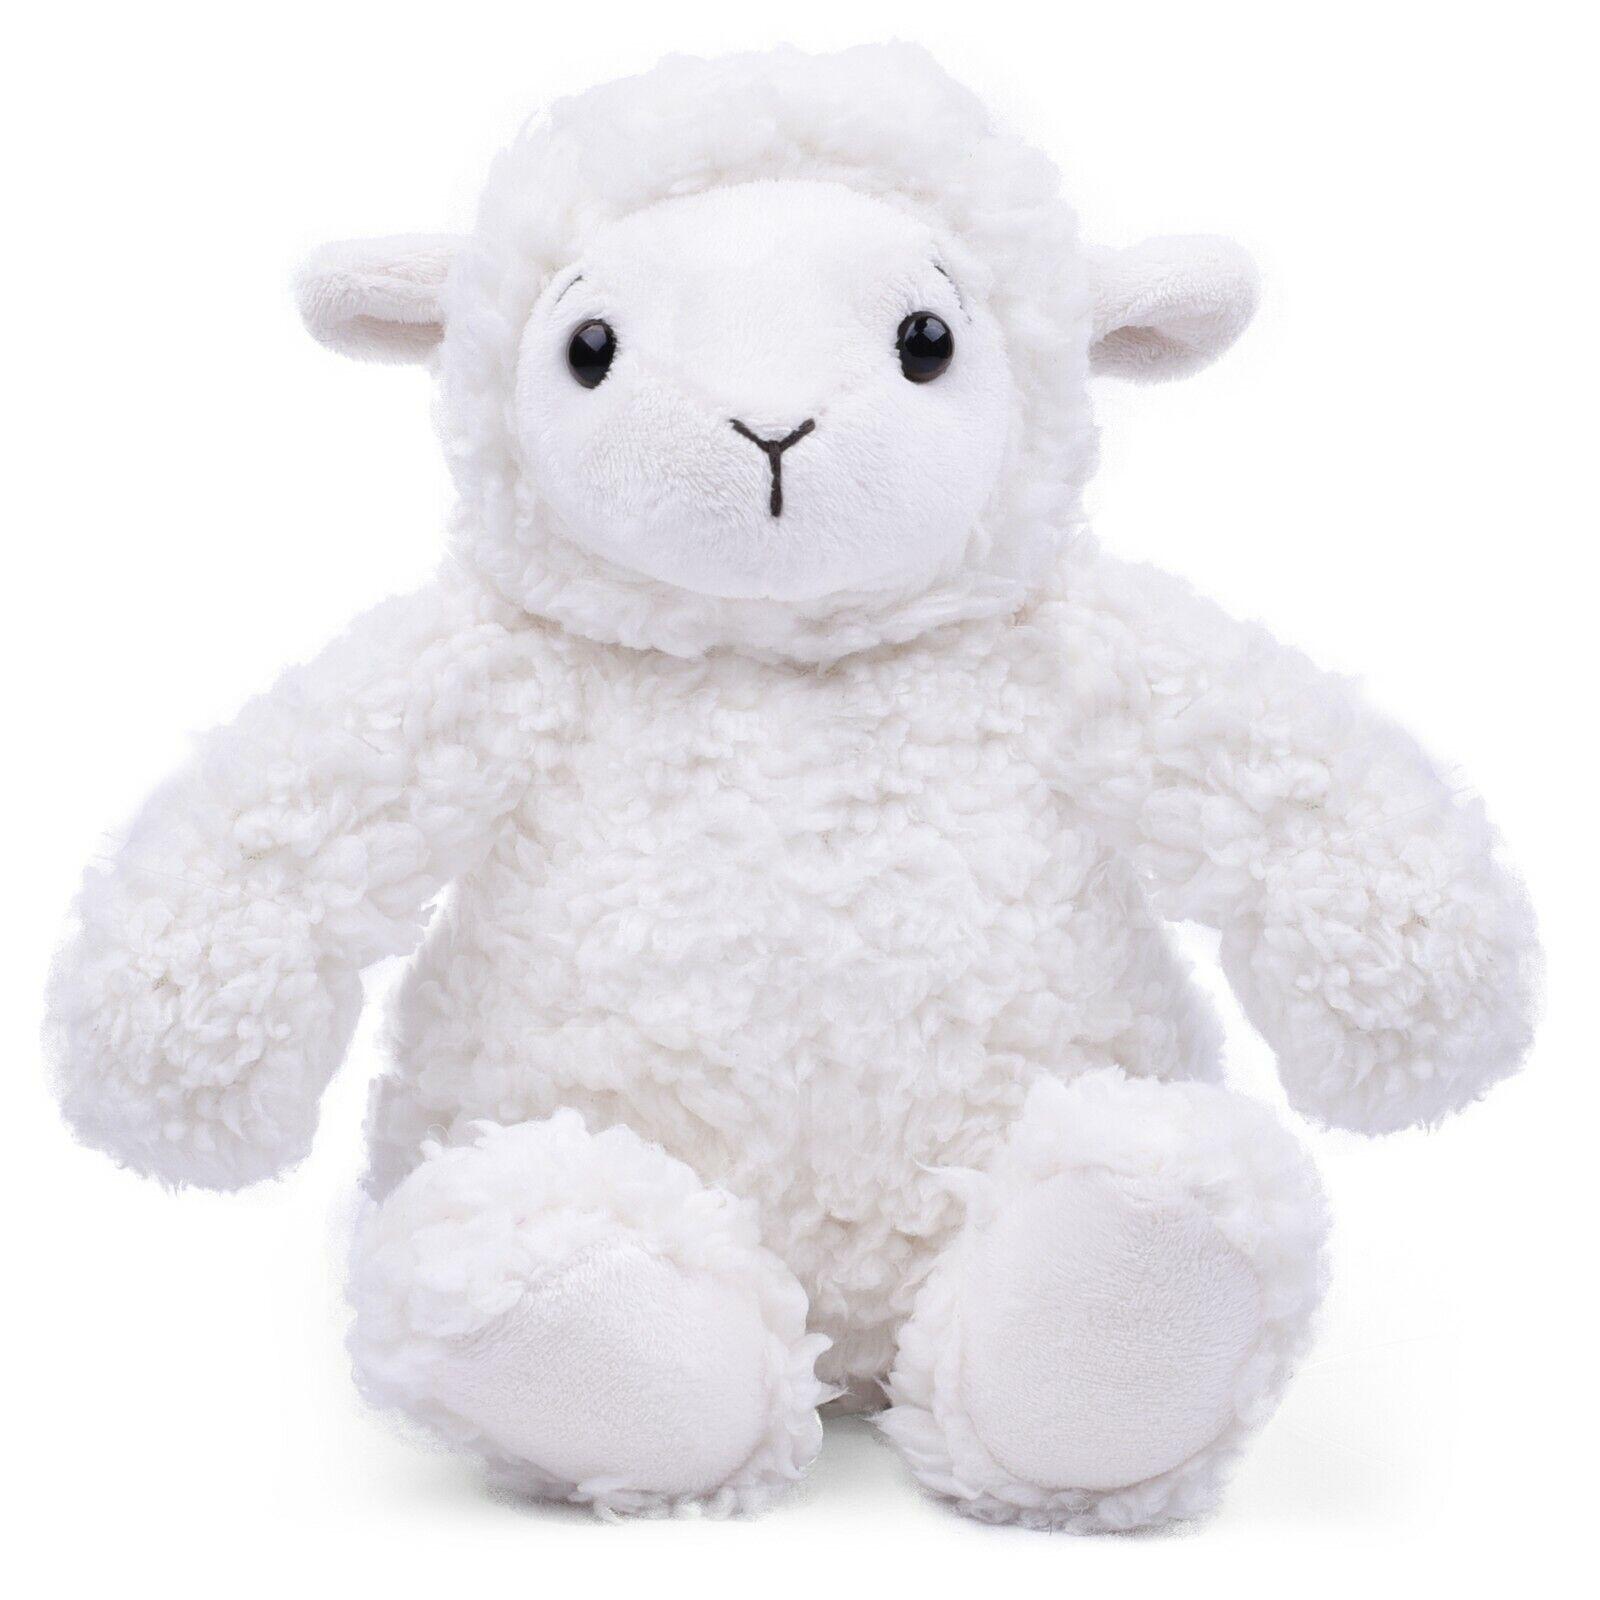 2019 Sheep Plush Stuffed Animals Toys Baby Lamb Doll Soft Xm